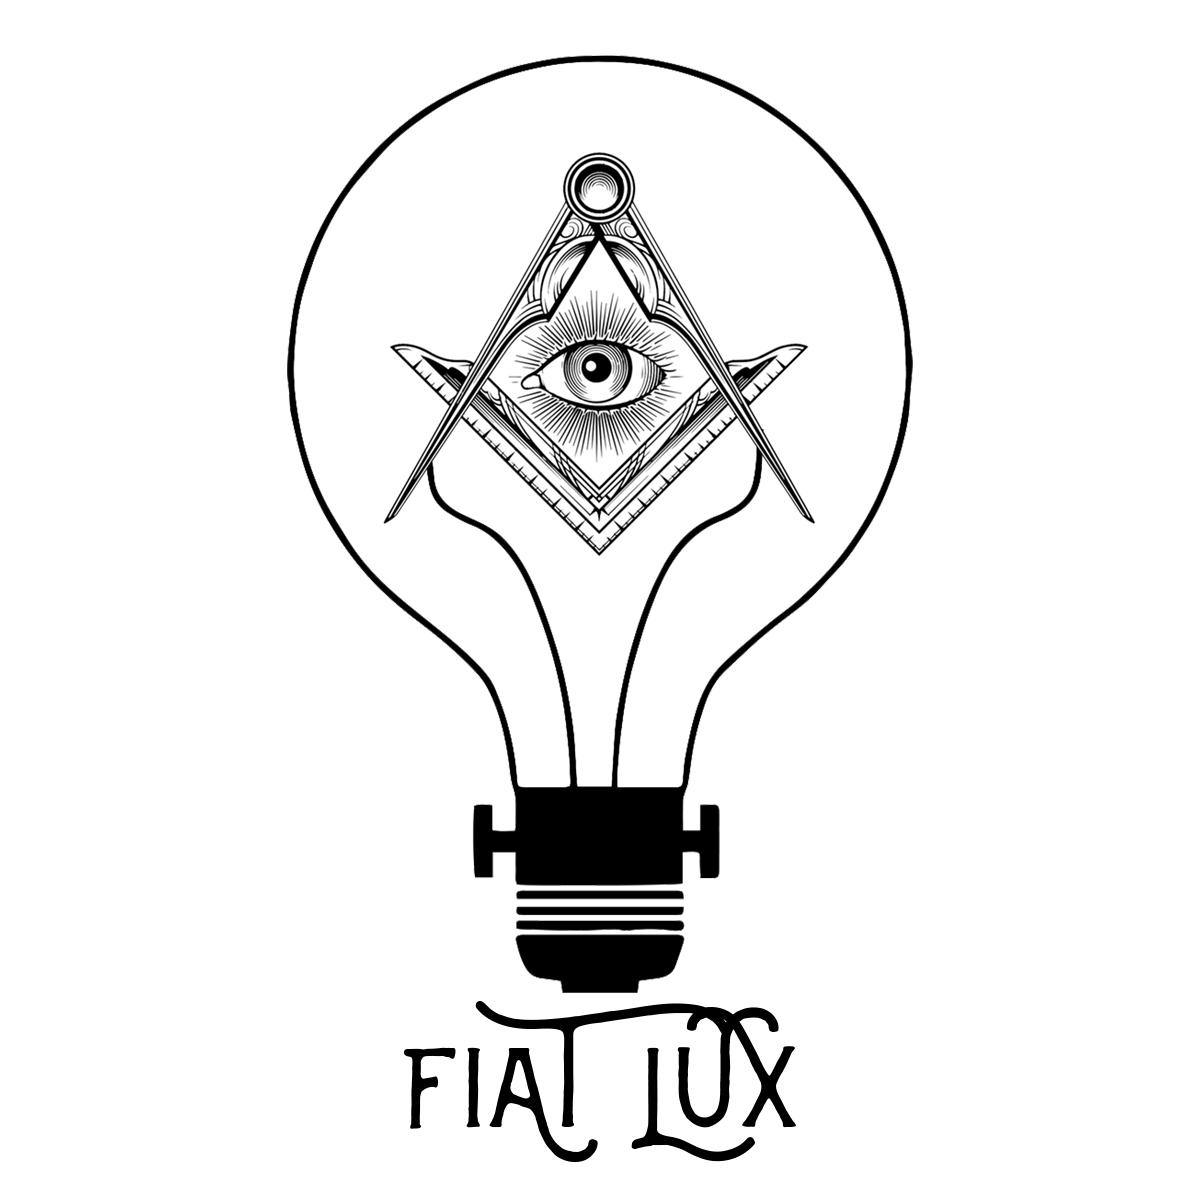 Fiat Lux Lightbulb Square And Compass Masonic Women S V